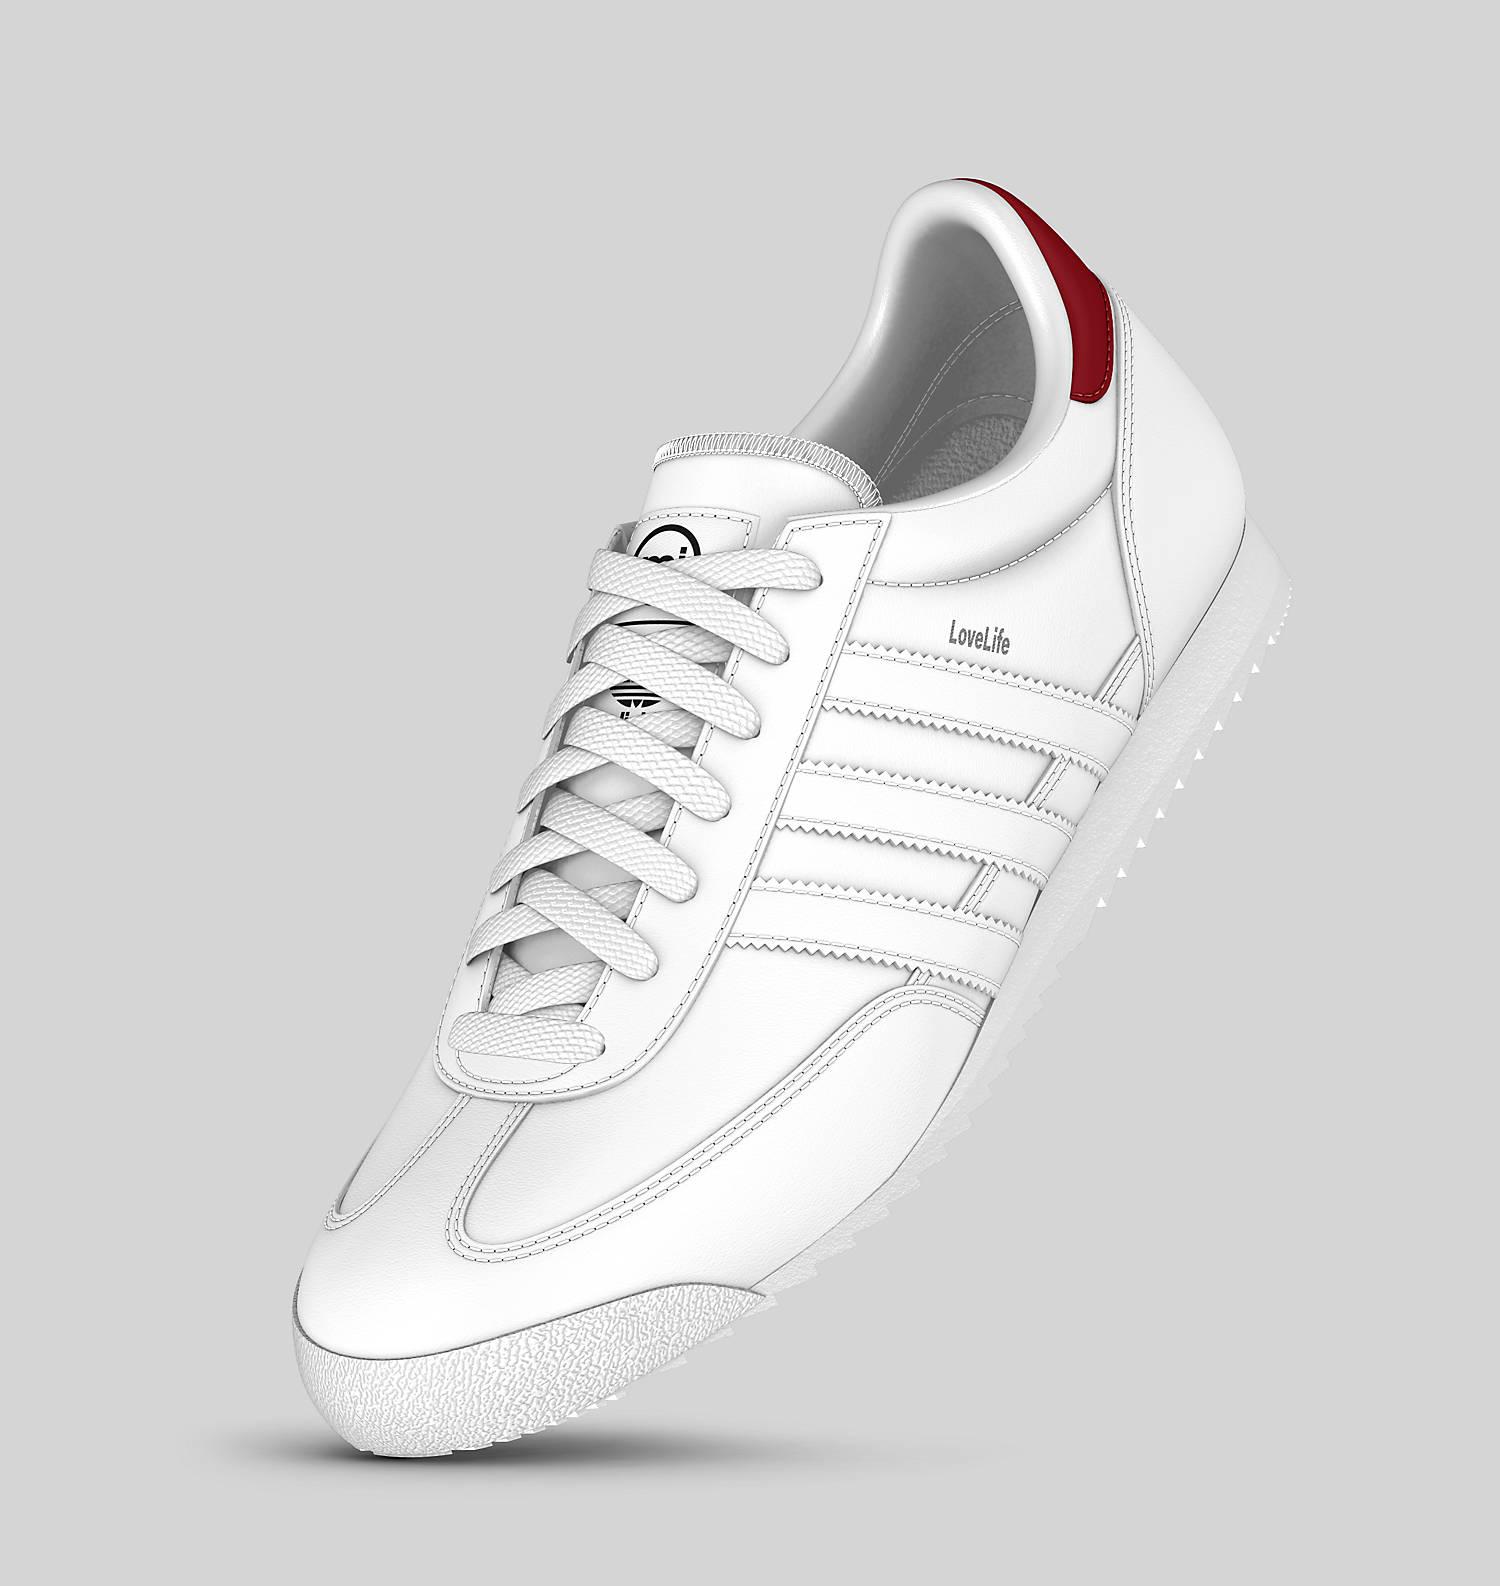 Adidas MI DRAGON Custom Shoes